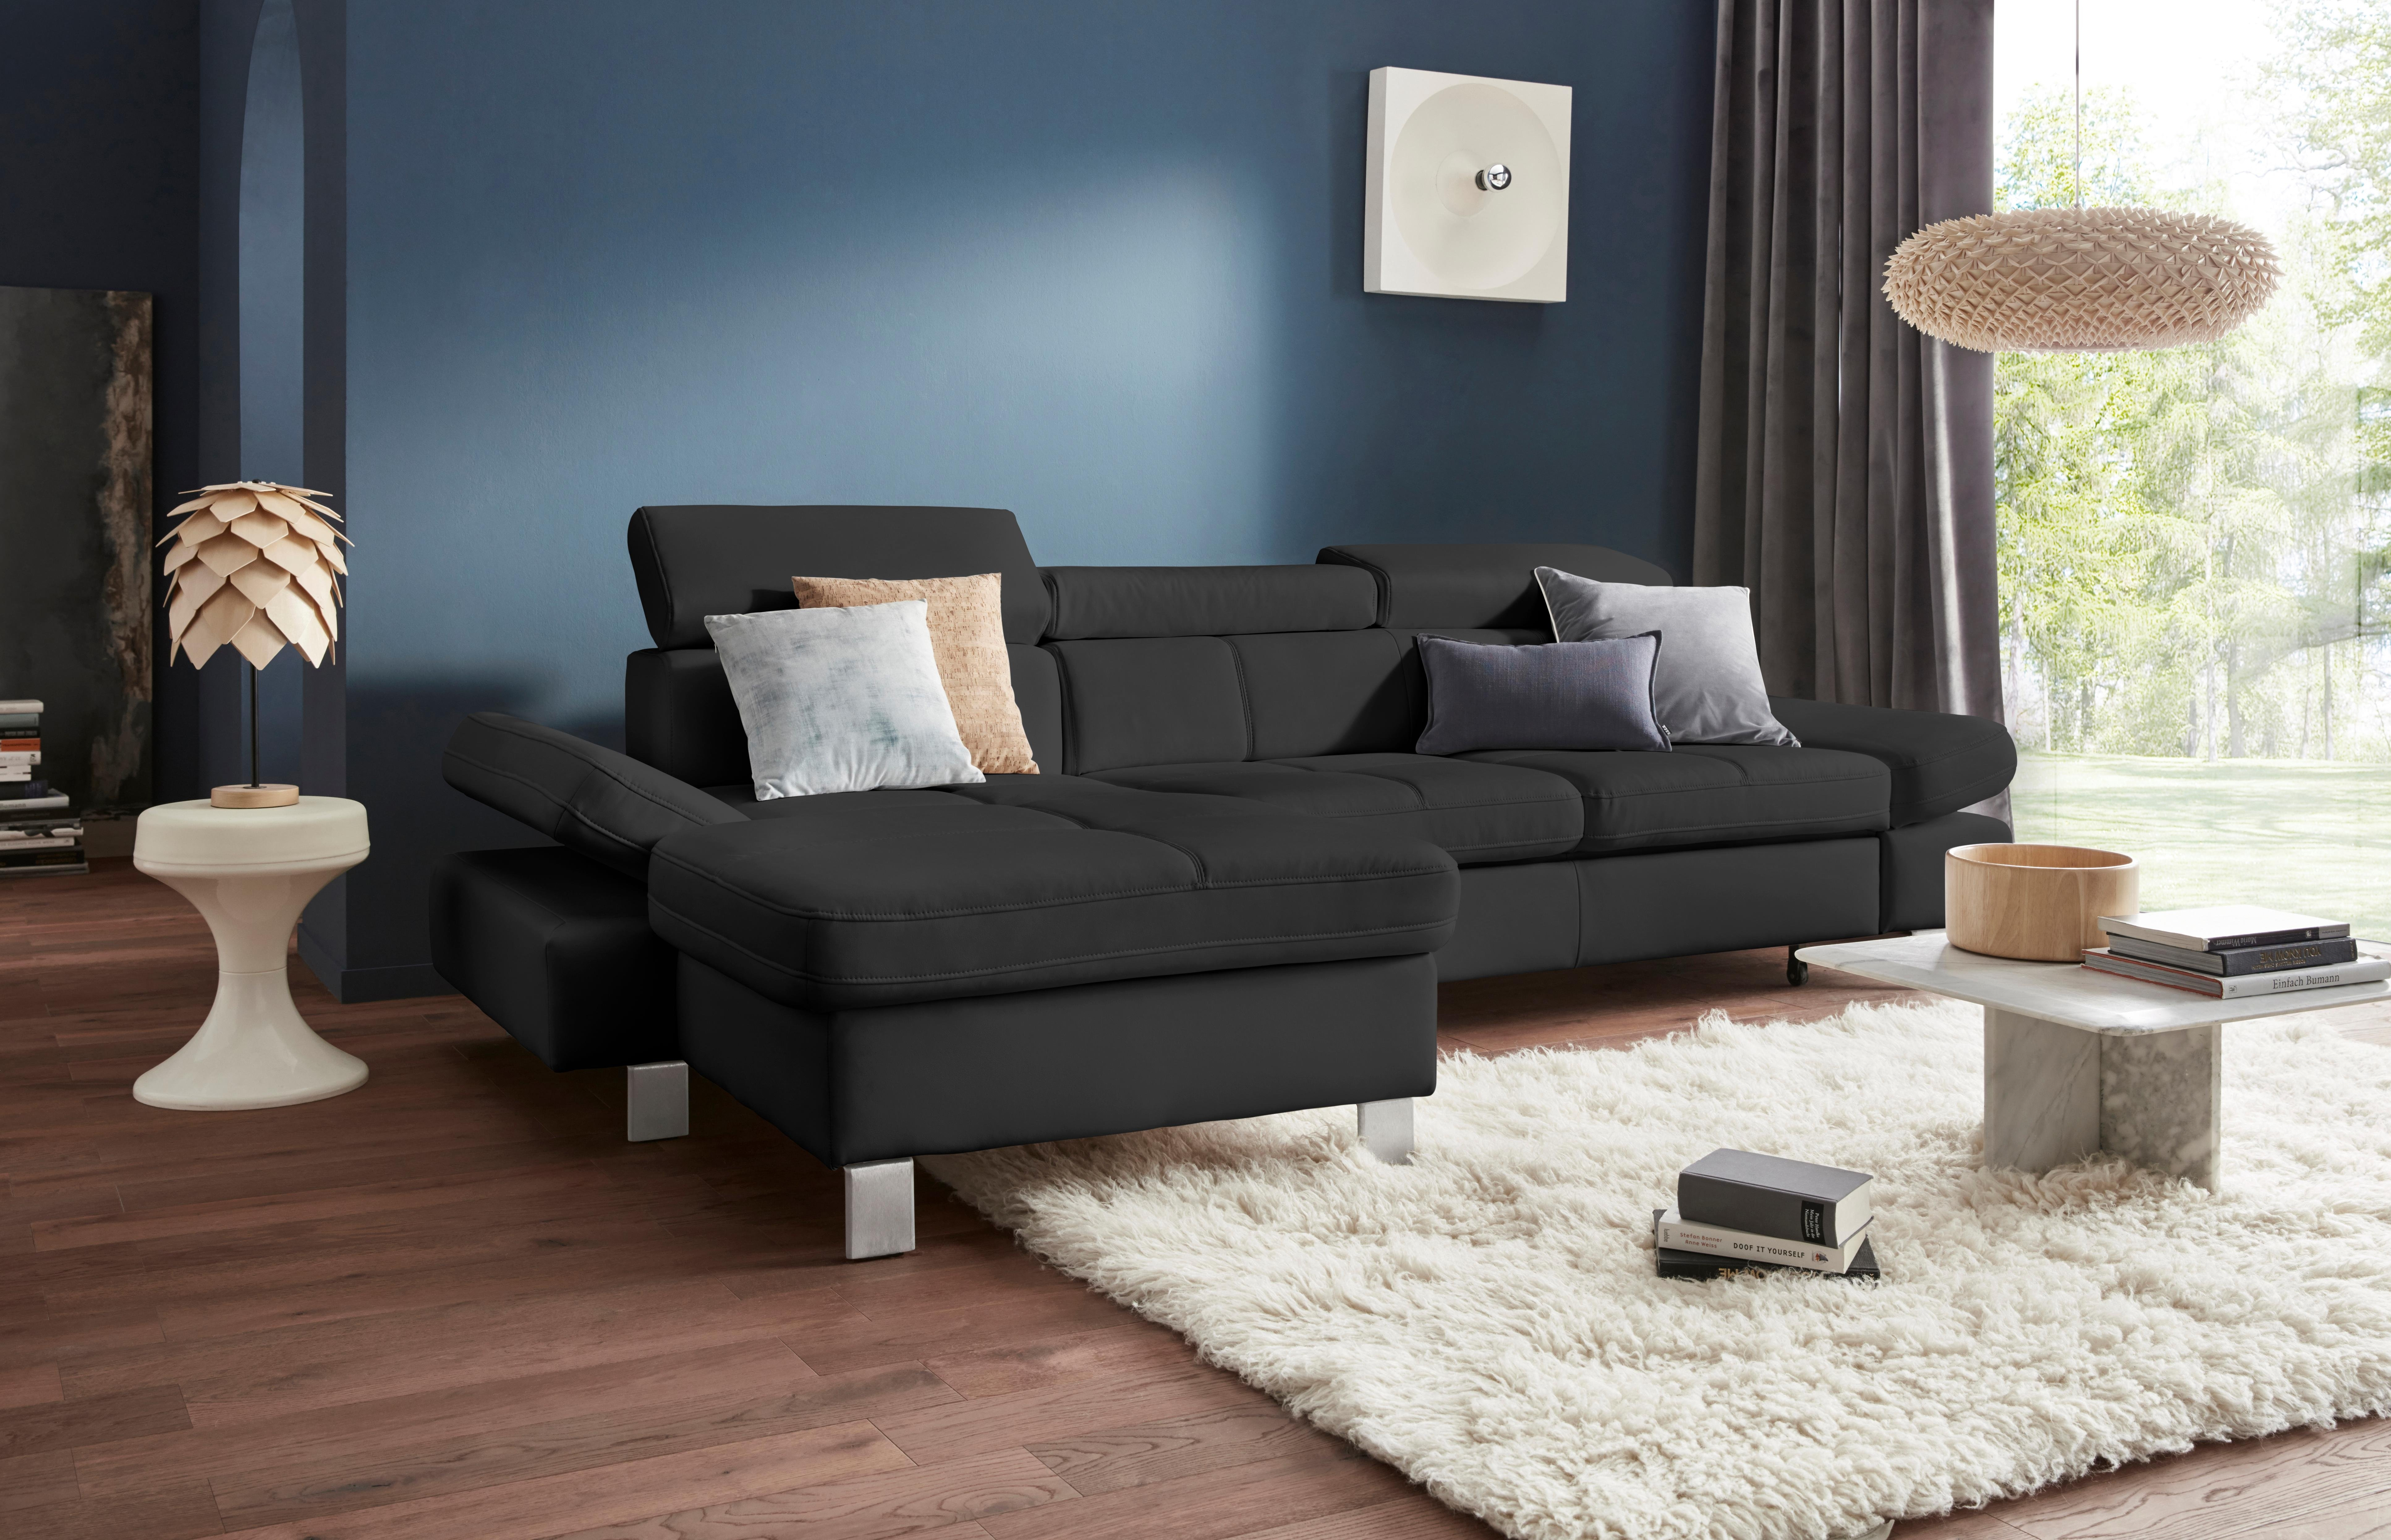 exxpo - sofa fashion hoekbank voordelig en veilig online kopen